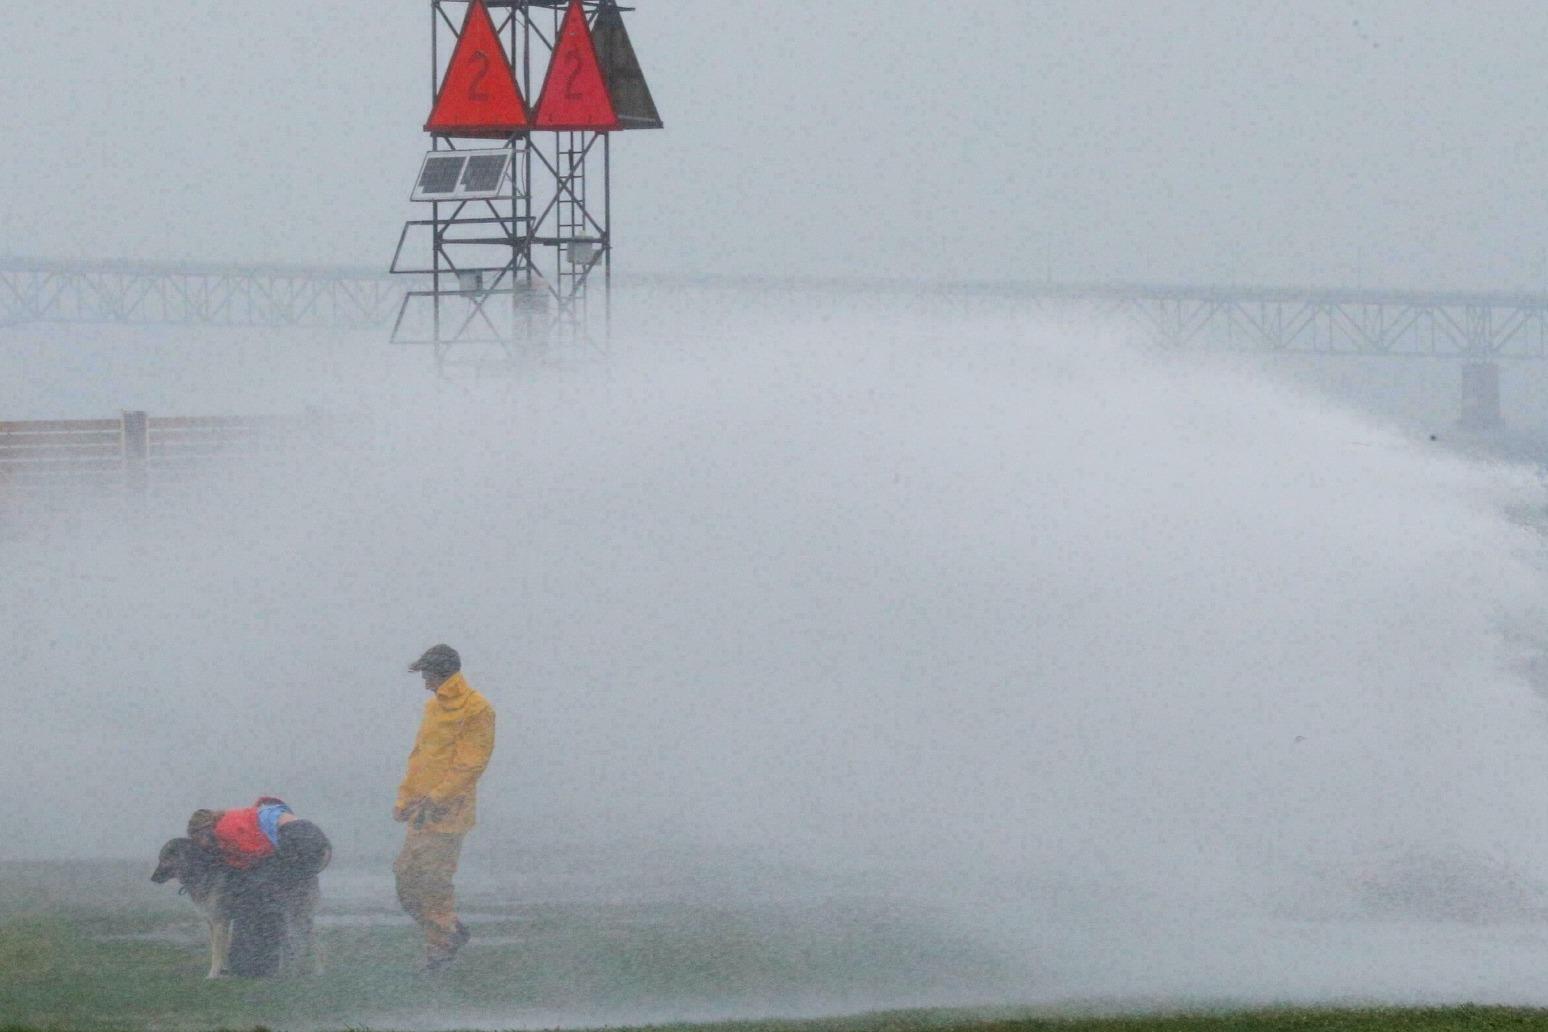 Tropical Storm Henri makes landfall on US East coast.